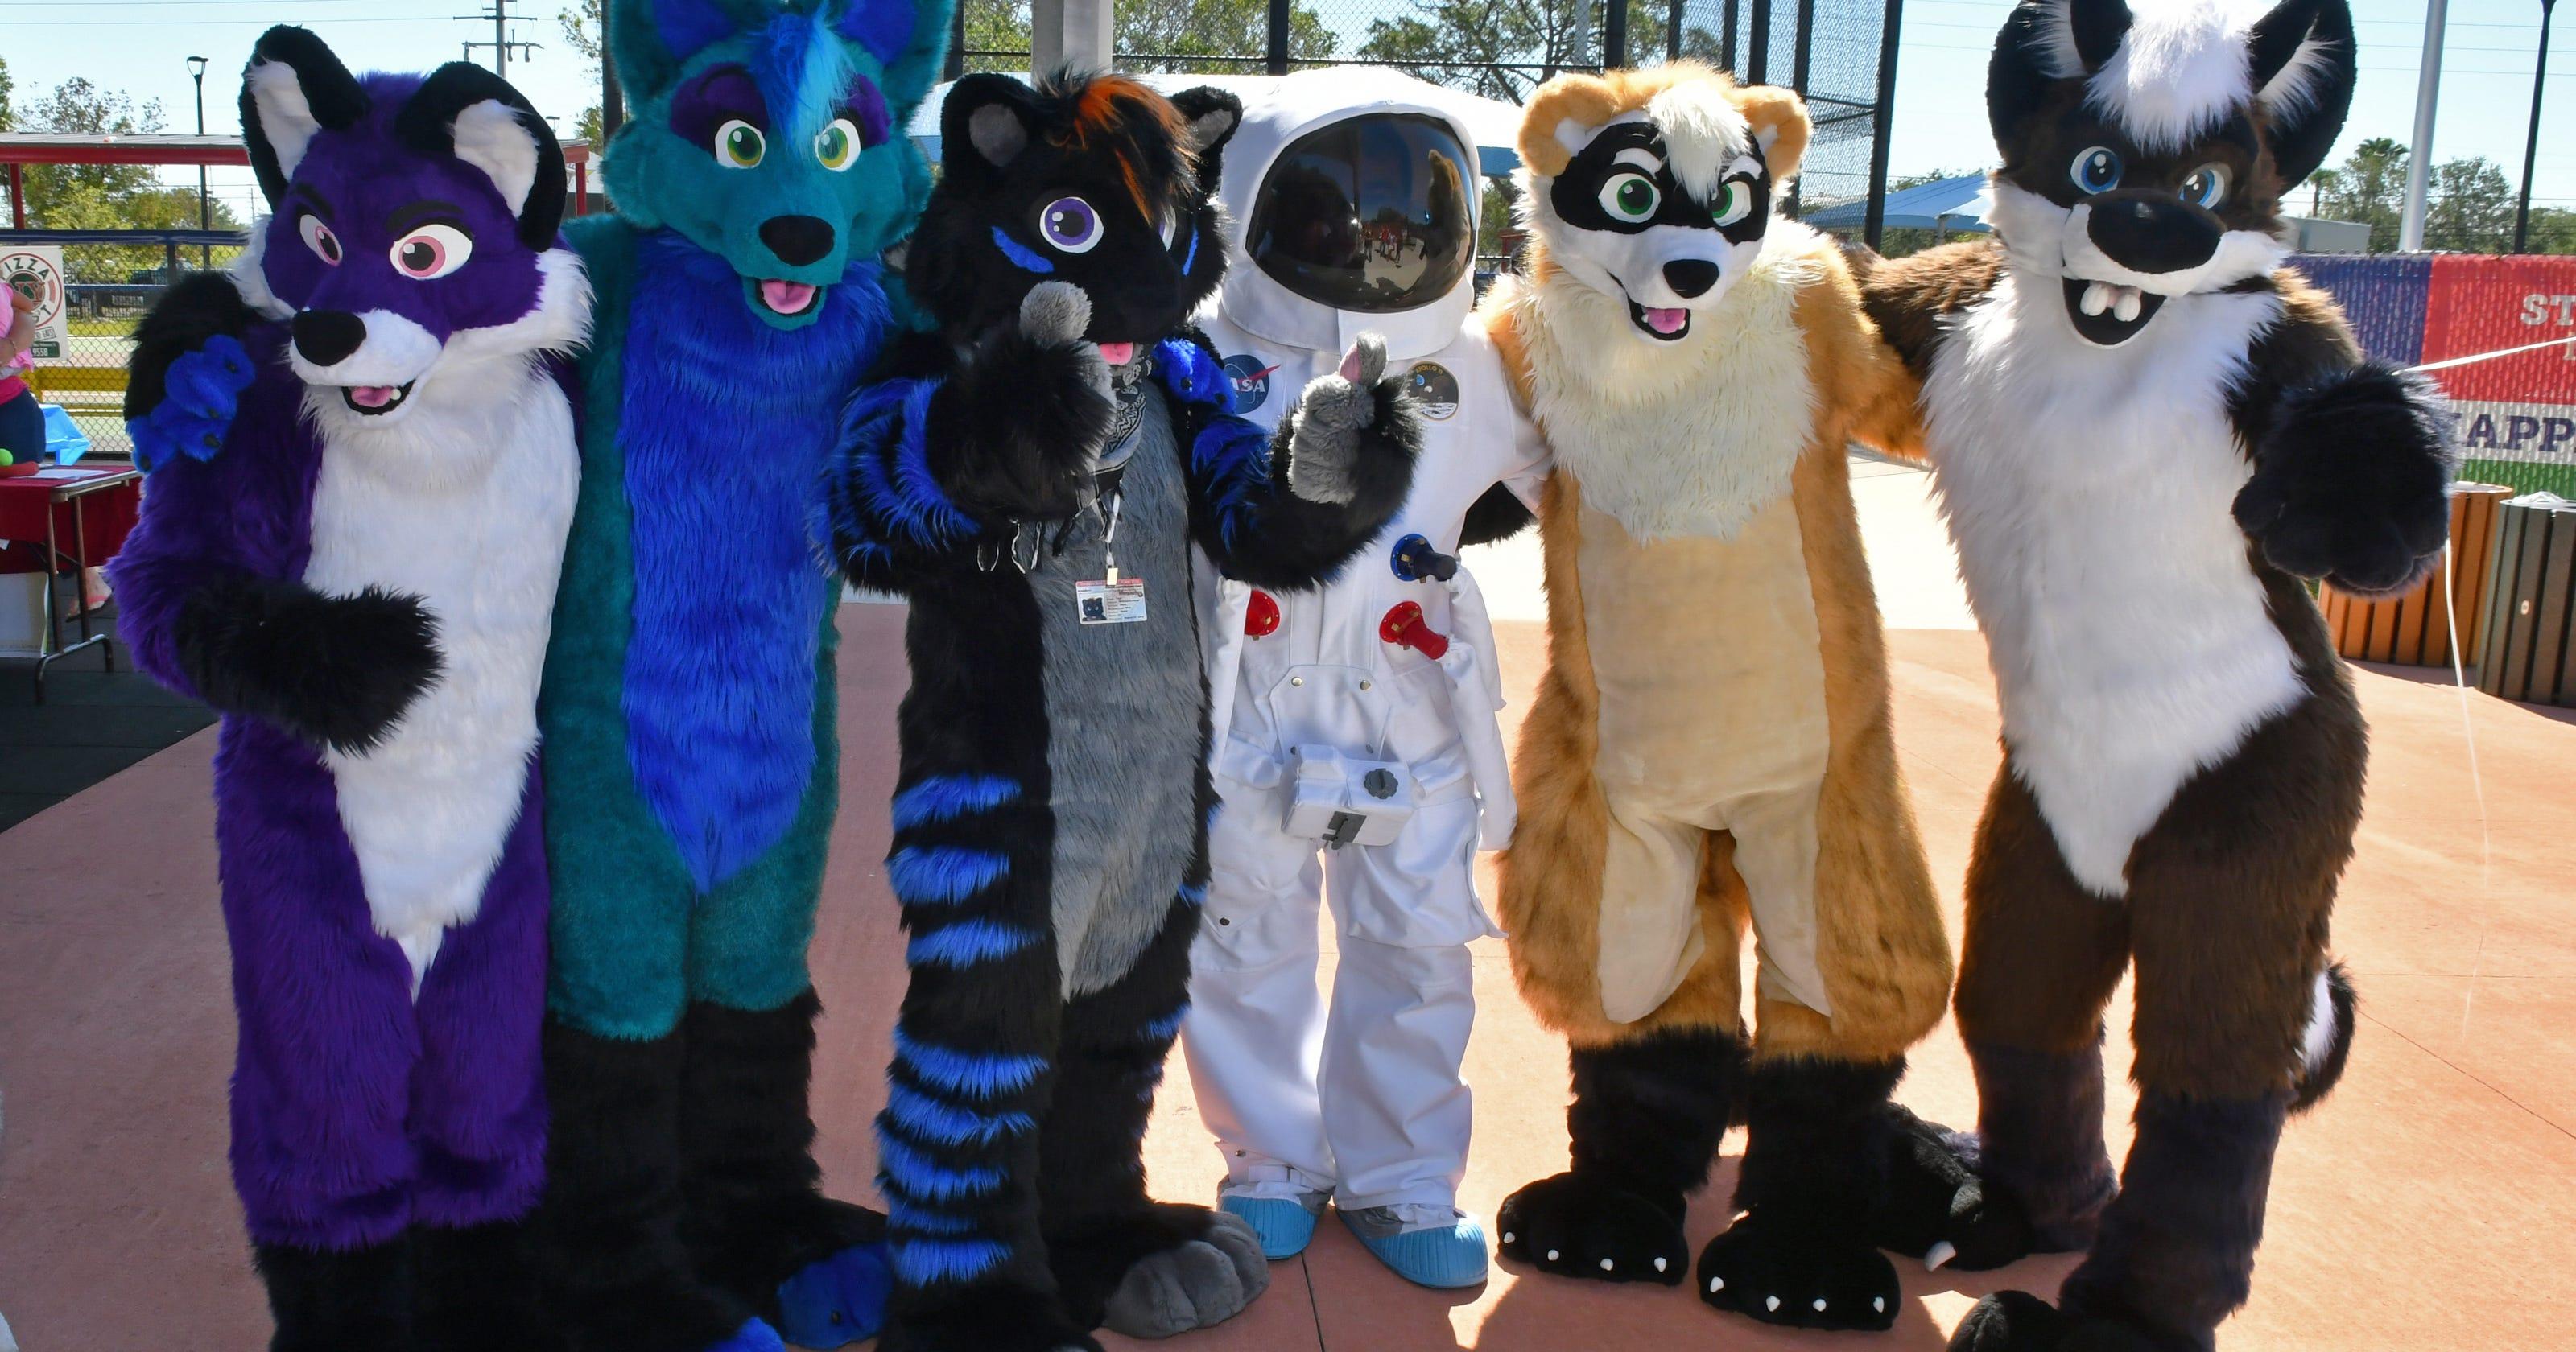 Unfurgettable Megaplex In Orlando Celebrates Furry Fandom